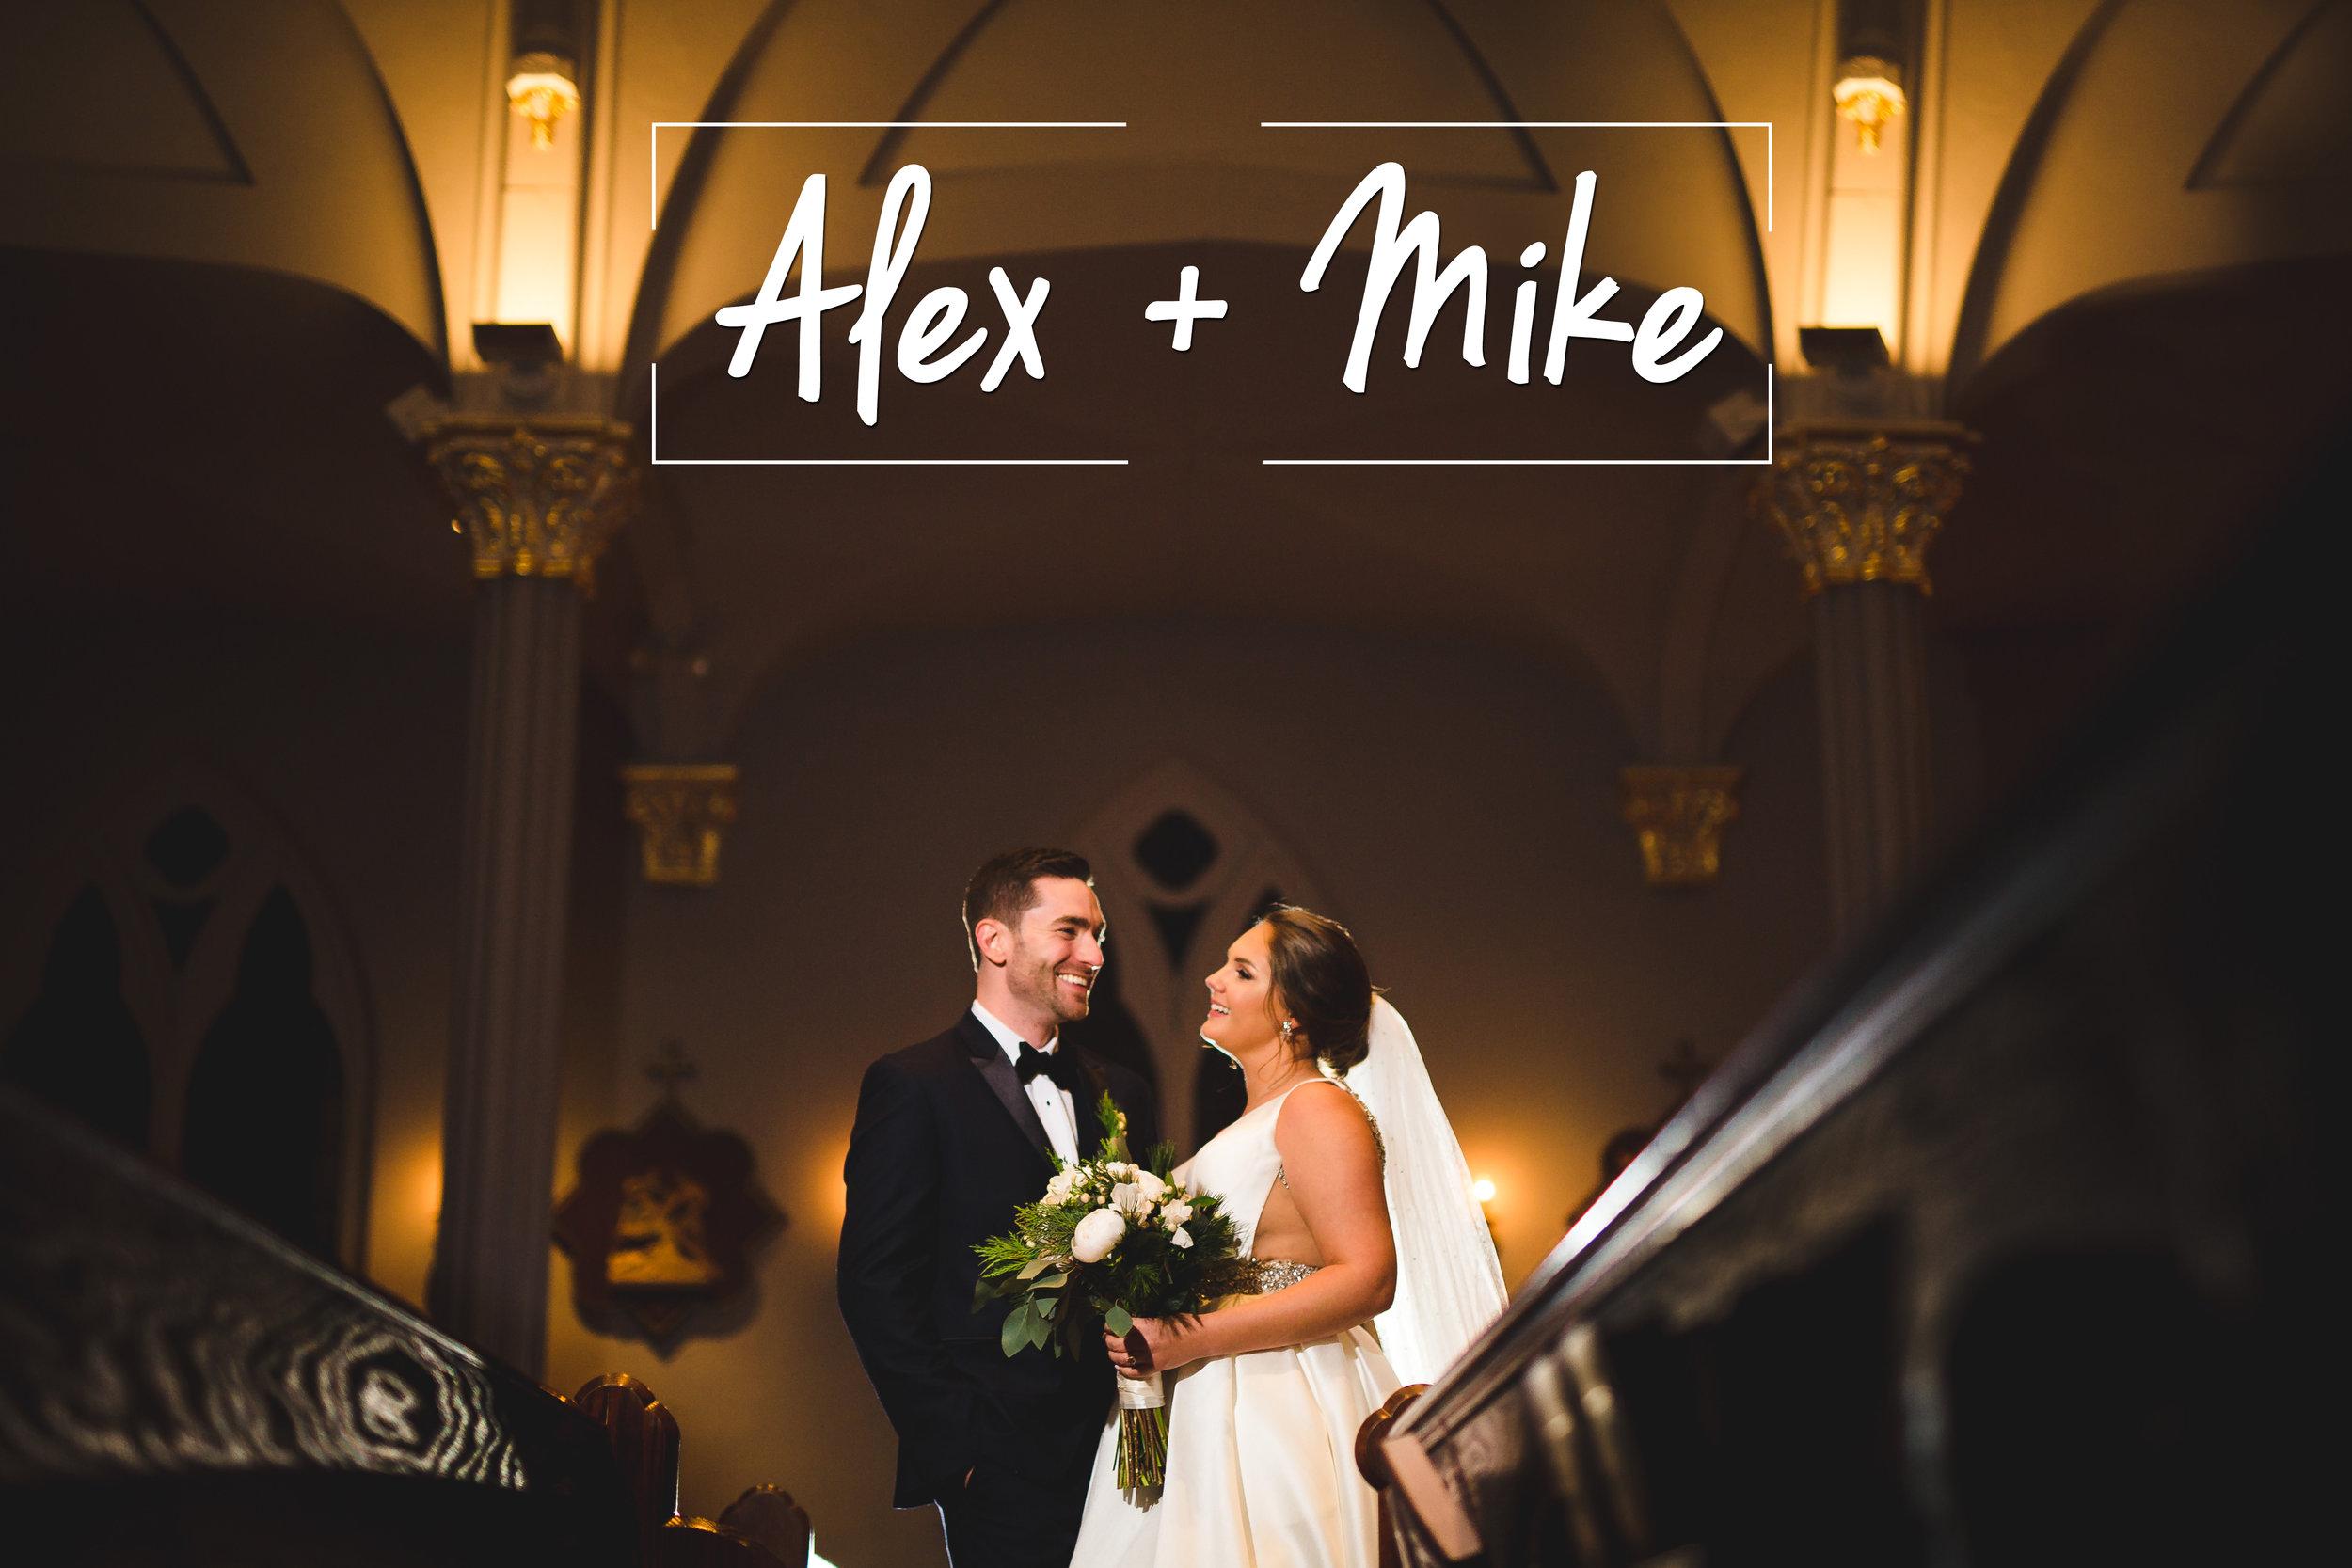 1107-Alex&Mike_formals-9U6A4570 copy.jpg